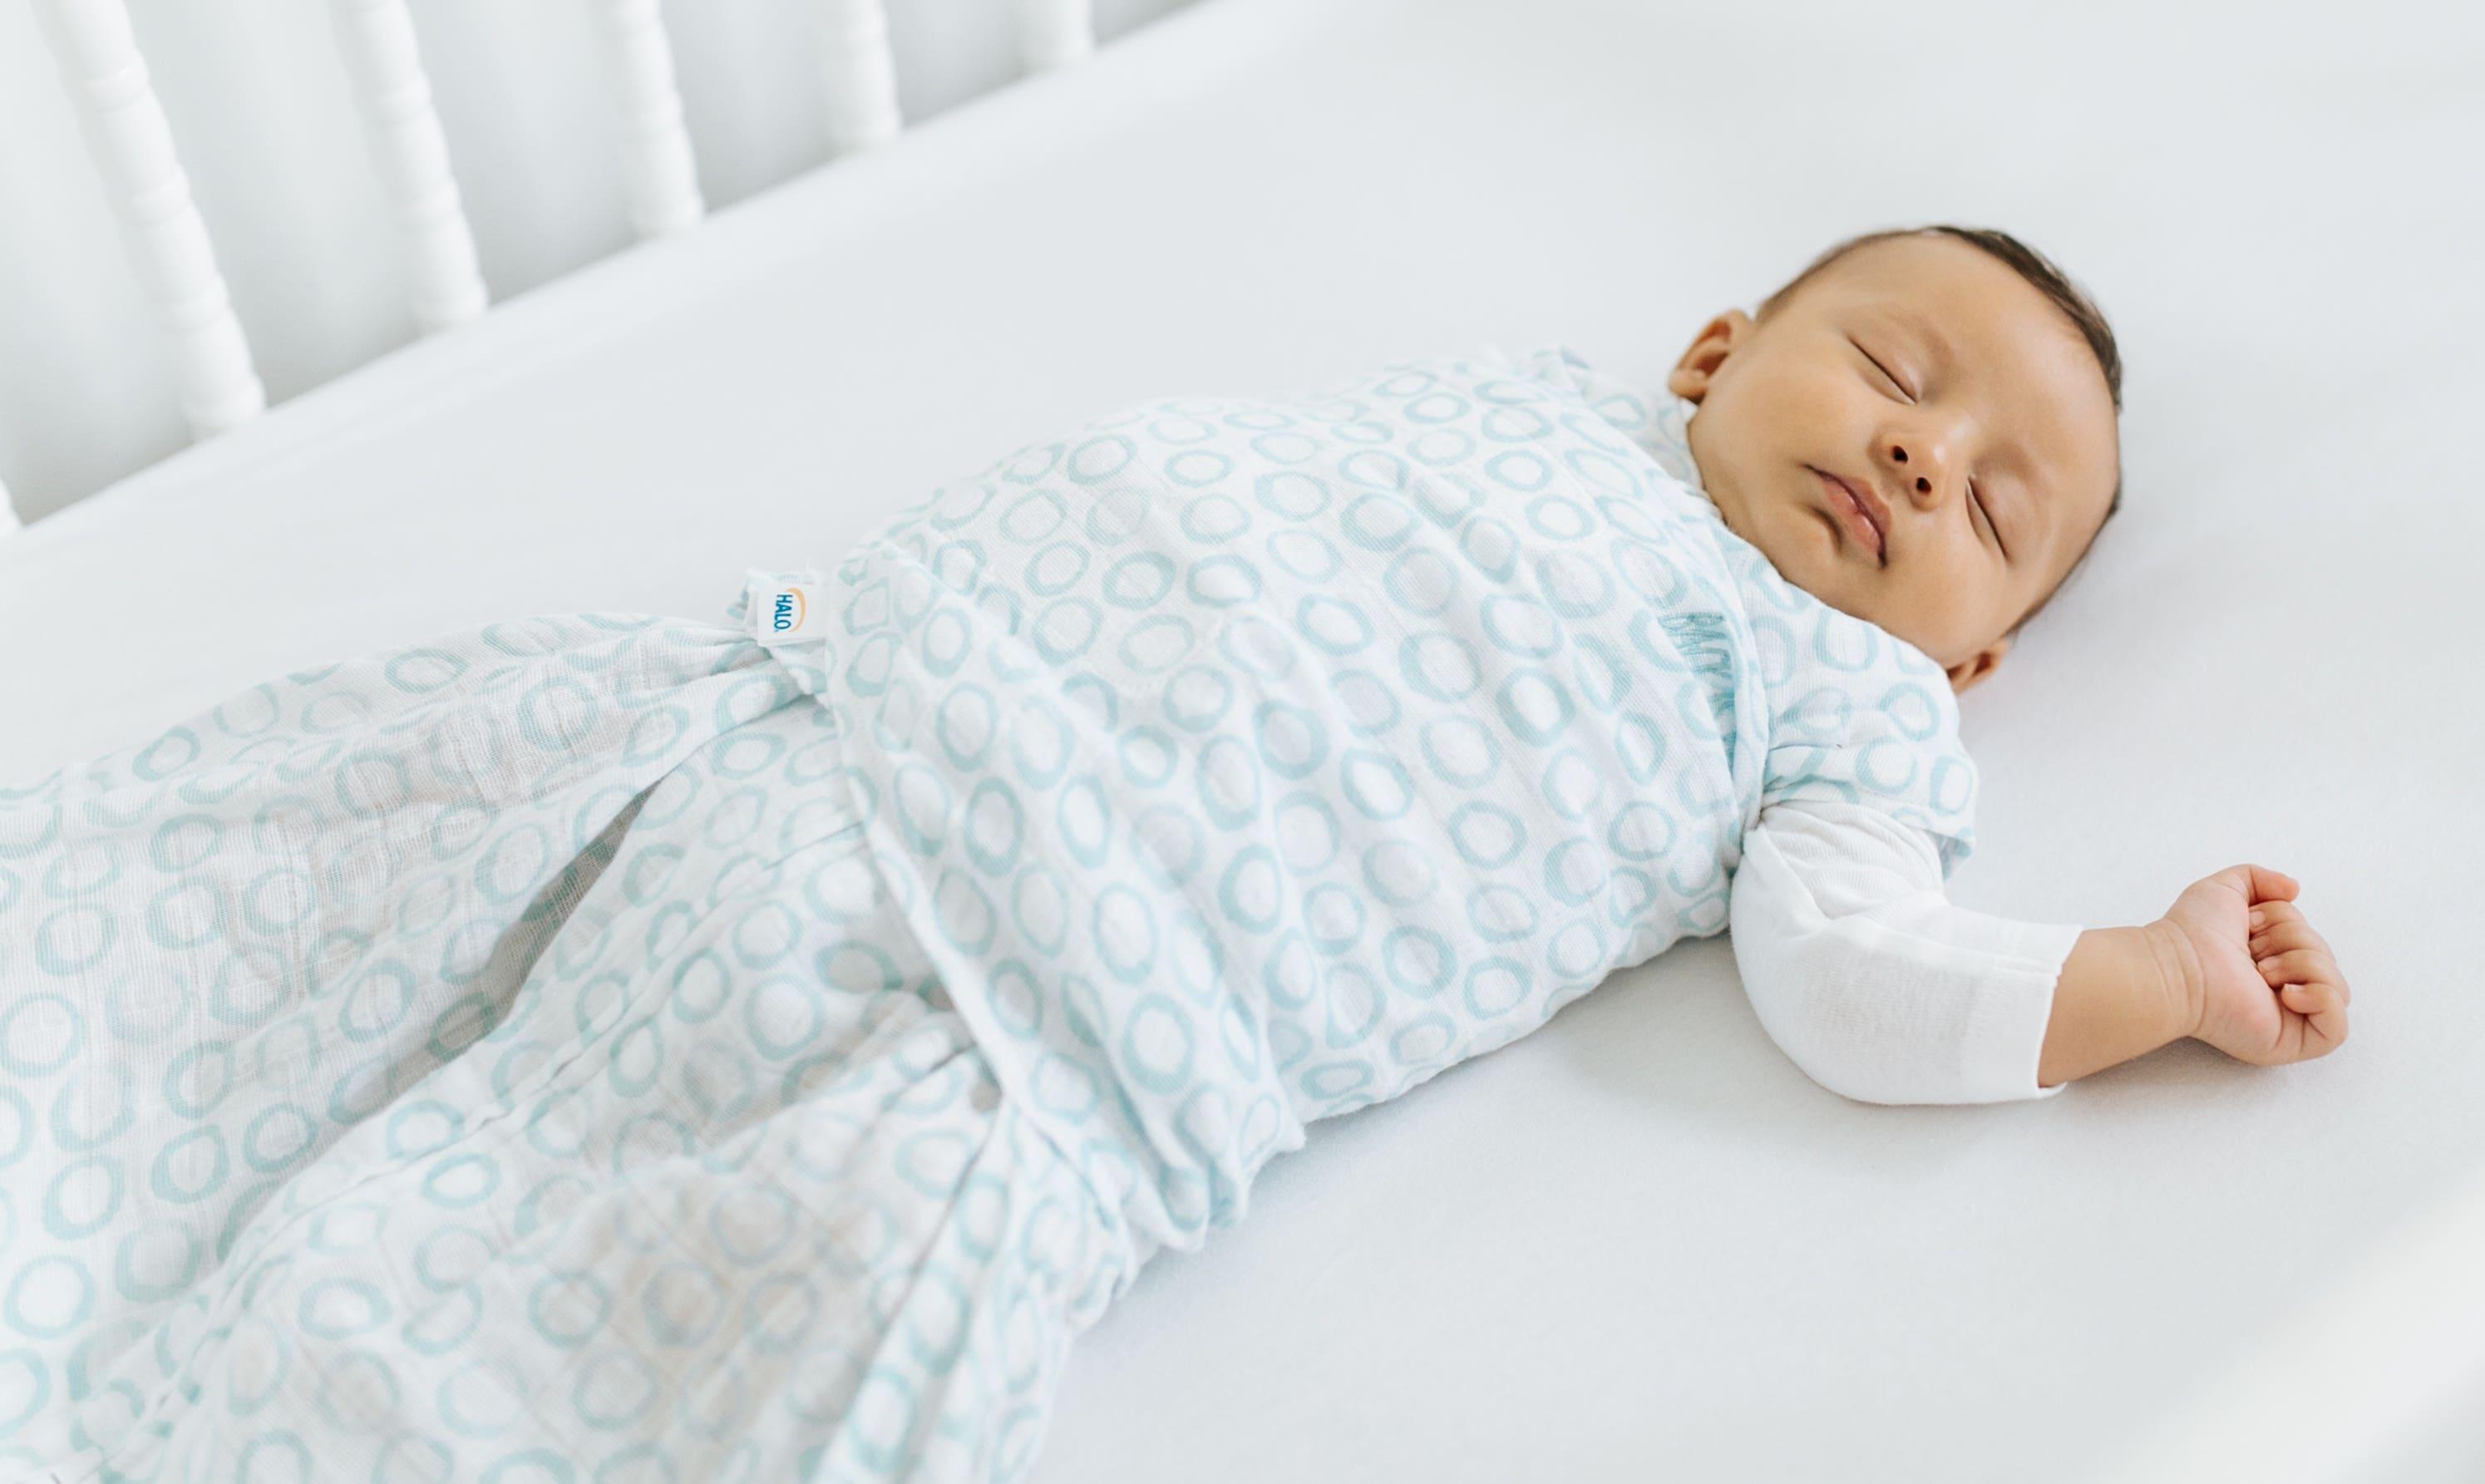 baby sleeping with one arm outside halo sleepsack swaddle